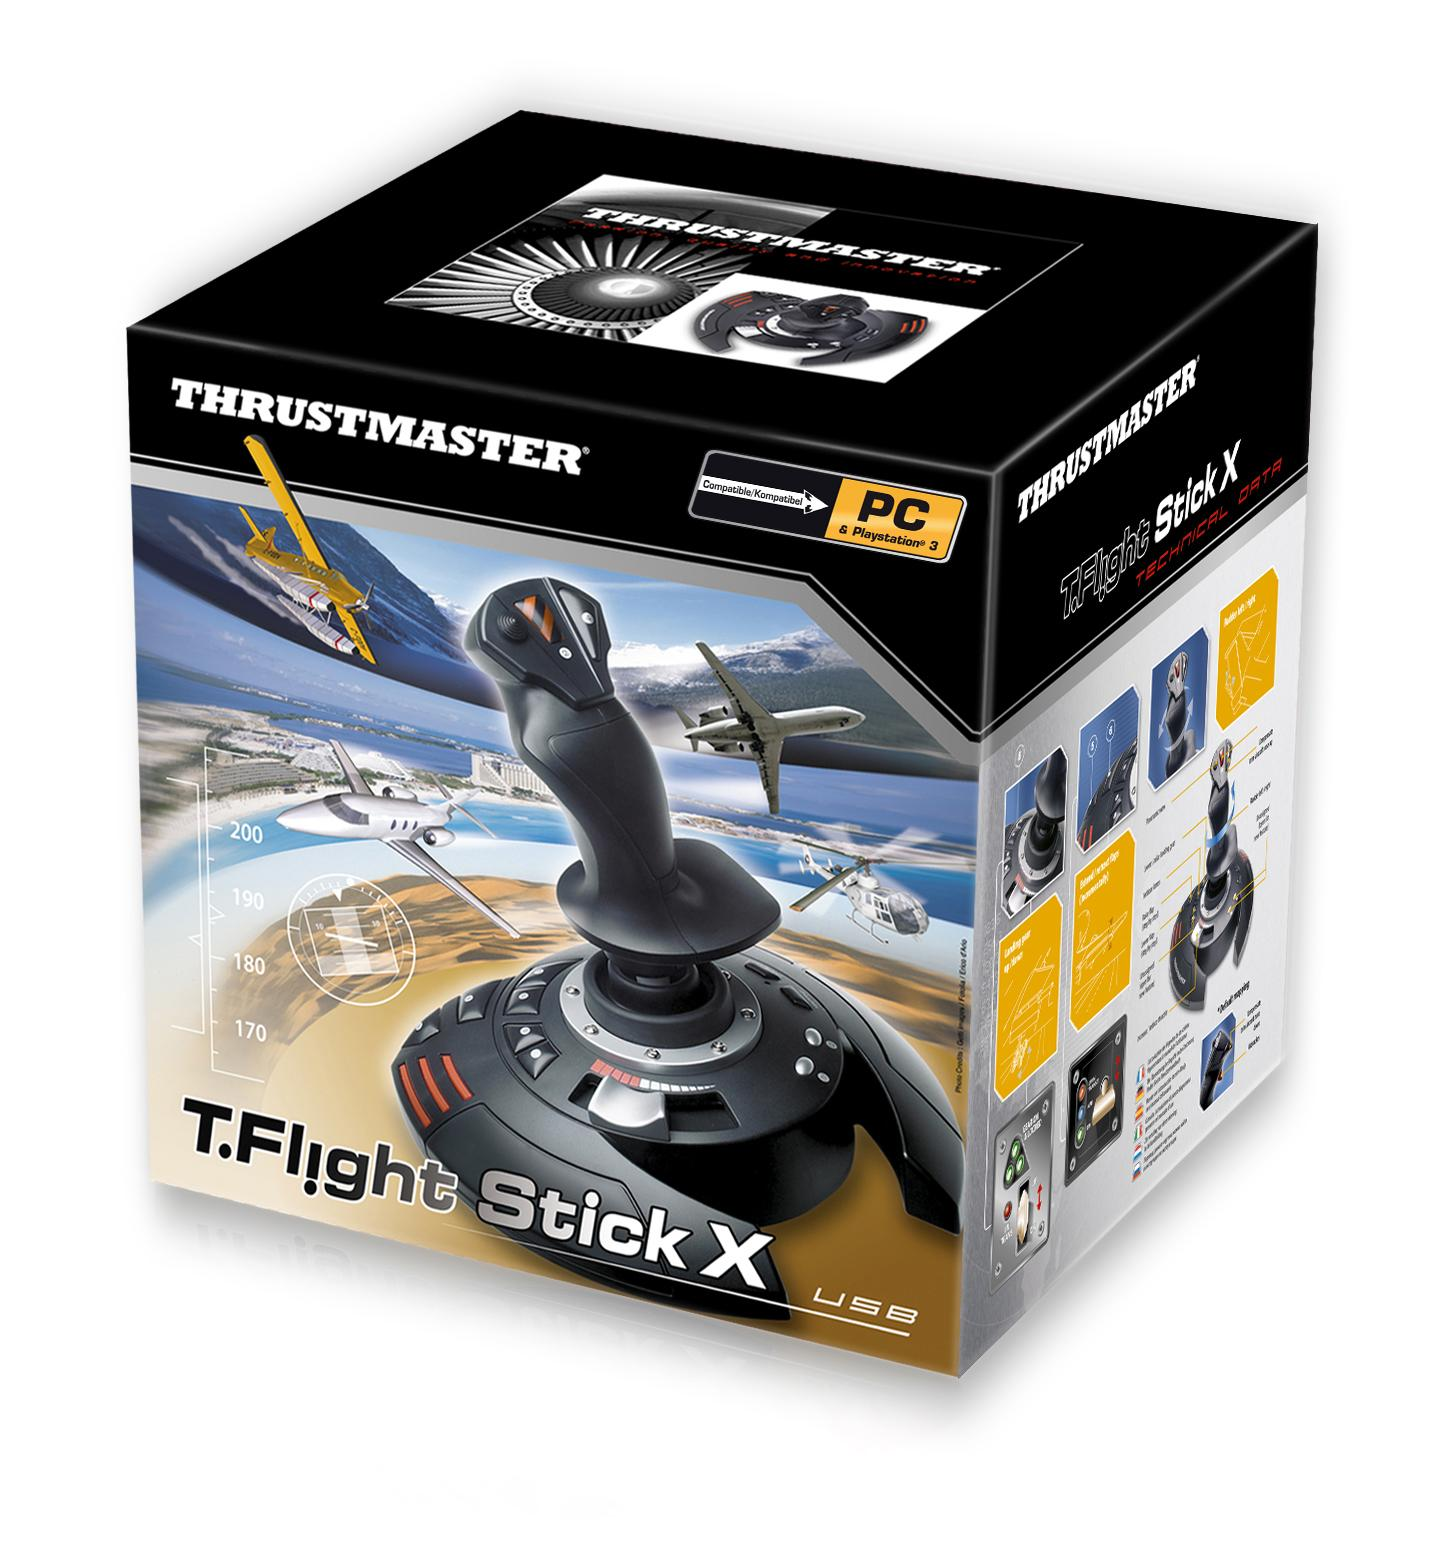 Amazon.com: Thrustmaster T-Flight Stick X PS3: PC: Video Games